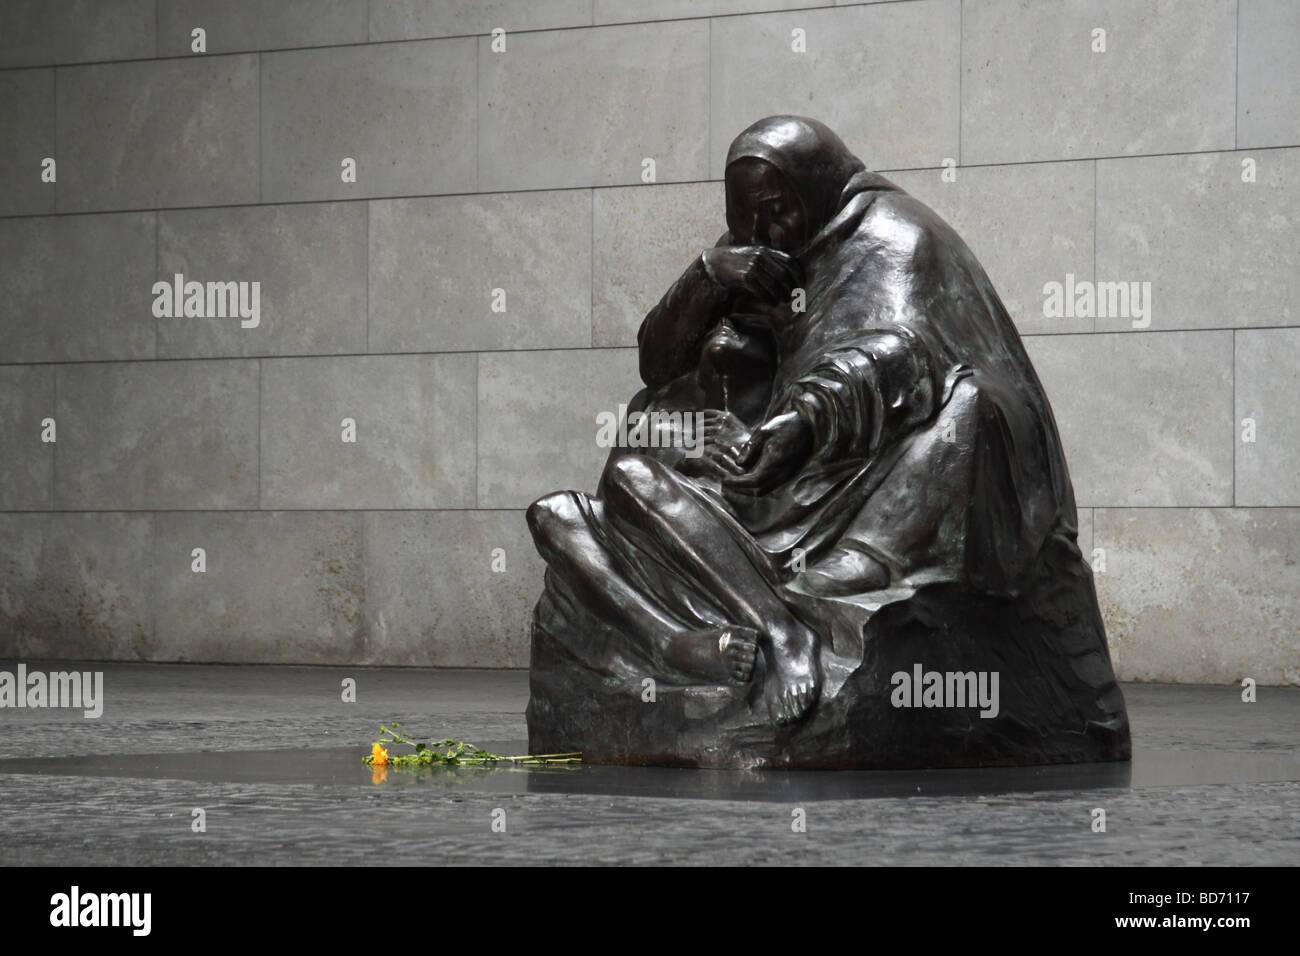 Pieta by Kaethe Kollwitz. New Guard House. The Mahnmal Memorial to the victims of war and tyranny, Berlin, Germany. - Stock Image